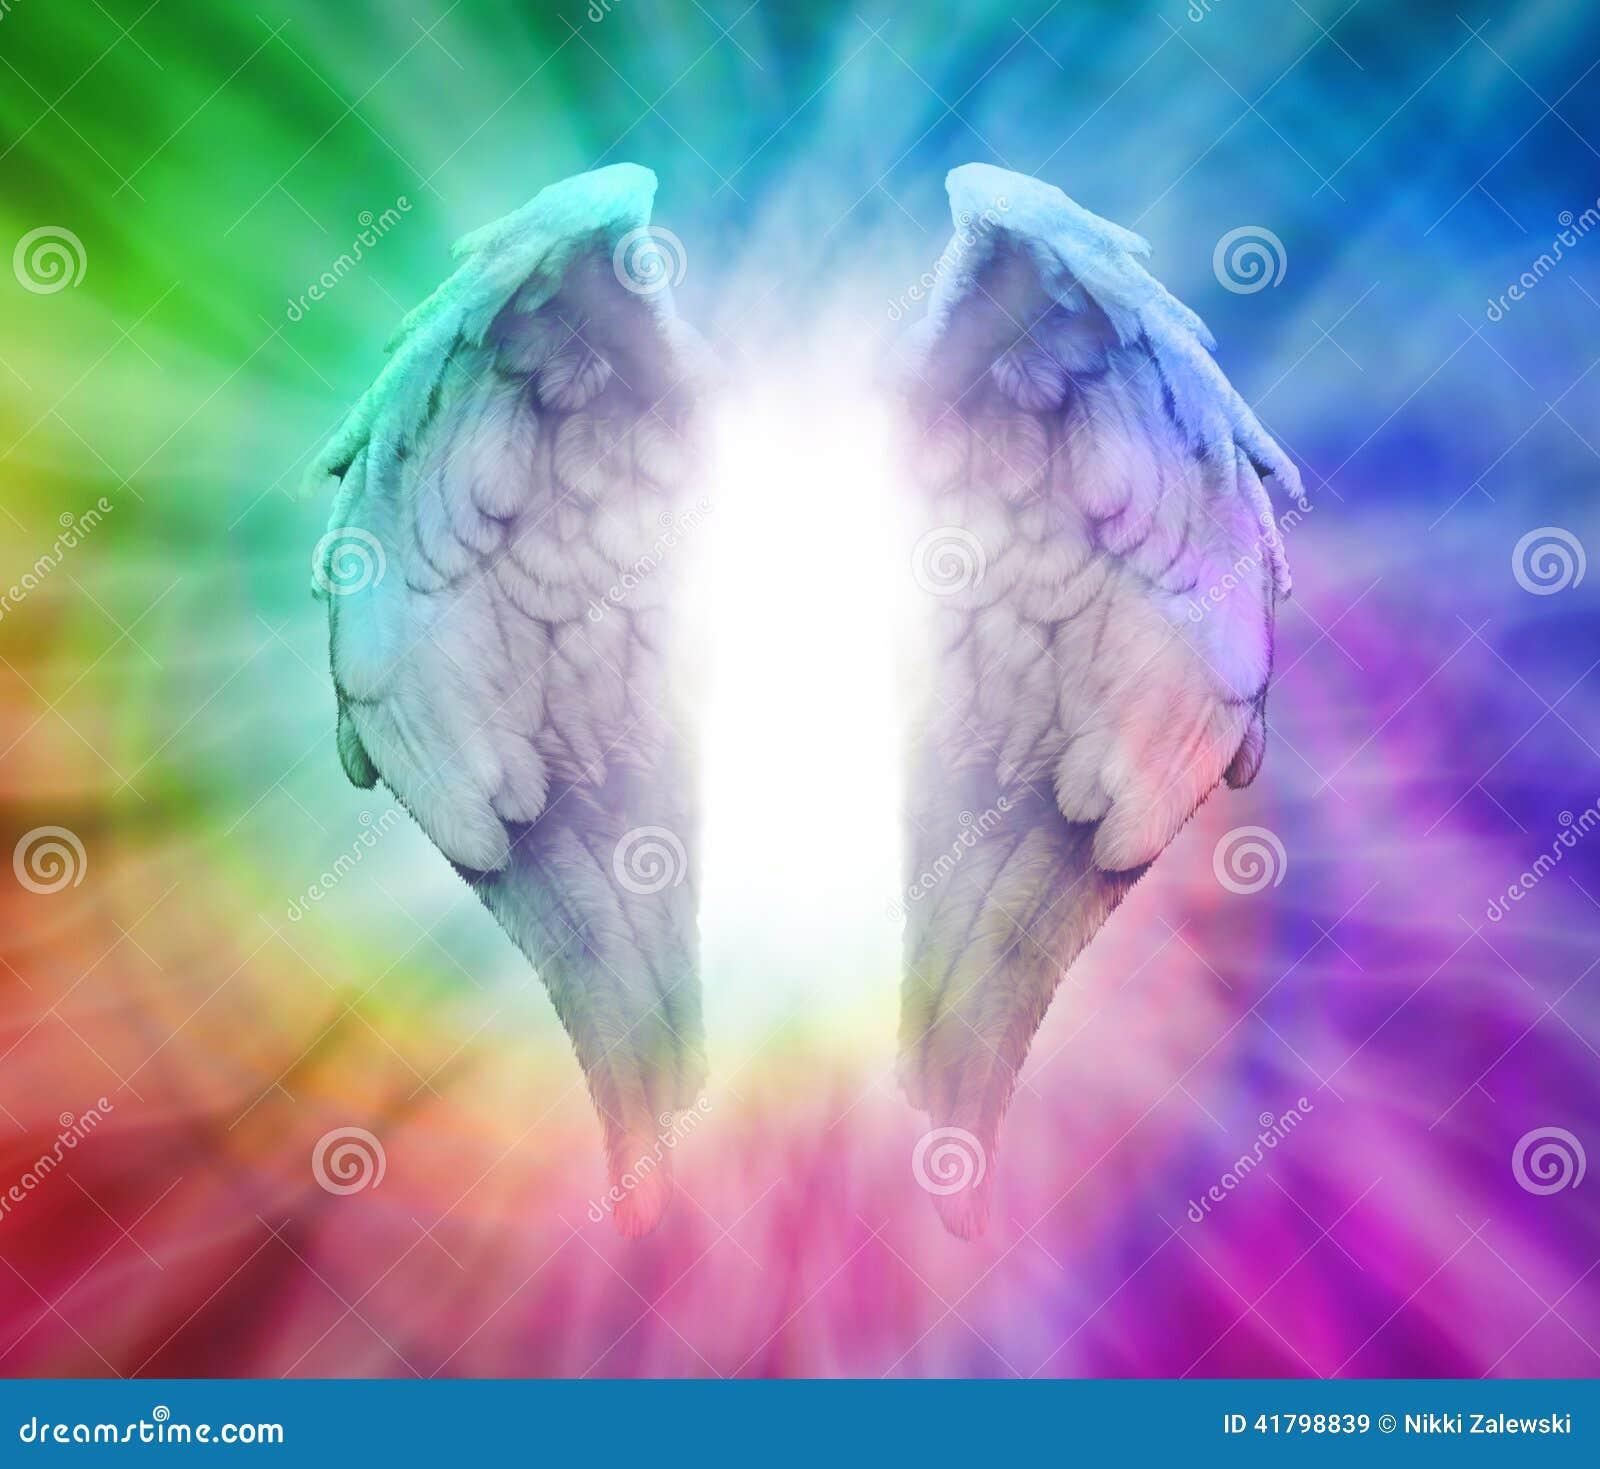 Colours of Angels - Reiki에 대한 이미지 검색결과